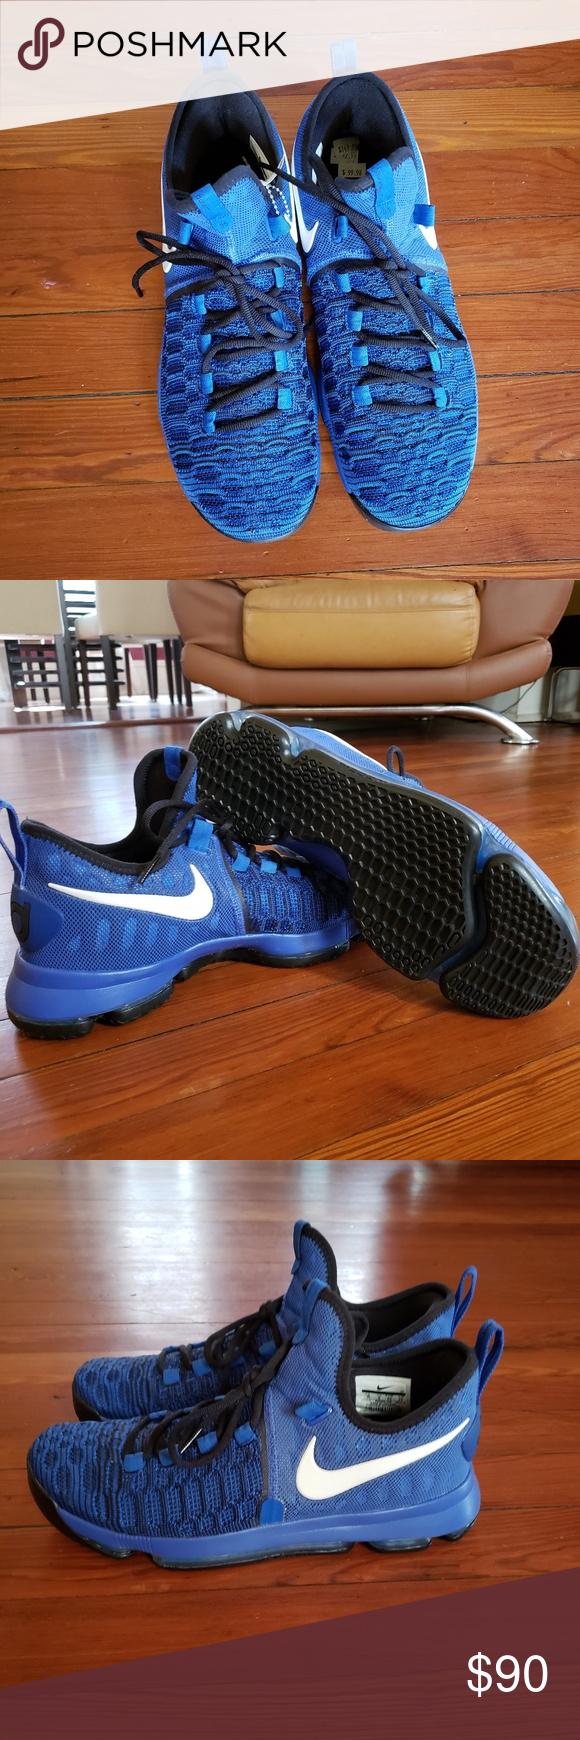 new product d396e 76519 Nike Zoom KD 9 On Court Royal Blue Black White NWOT Nike ...